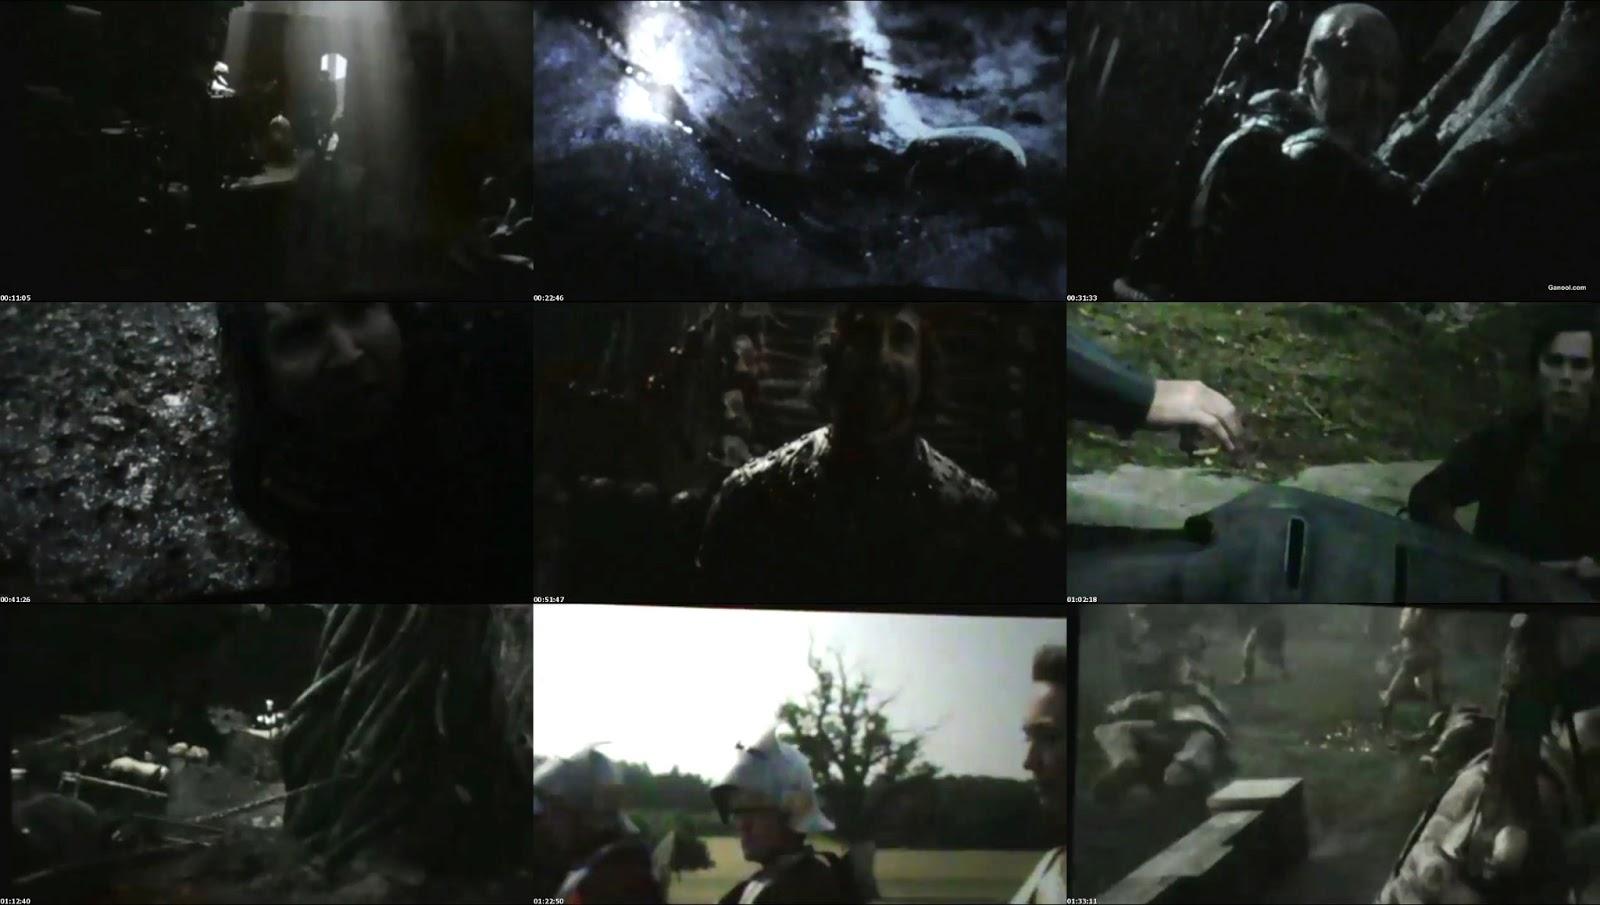 http://4.bp.blogspot.com/--LQ9MR9L0ao/UUXFn03fqpI/AAAAAAAABdE/mXLl3vjp1Jo/s1600/Jack+the+Giant+Slayer+(2013)+CAM+450MB+Hnmovies.jpg